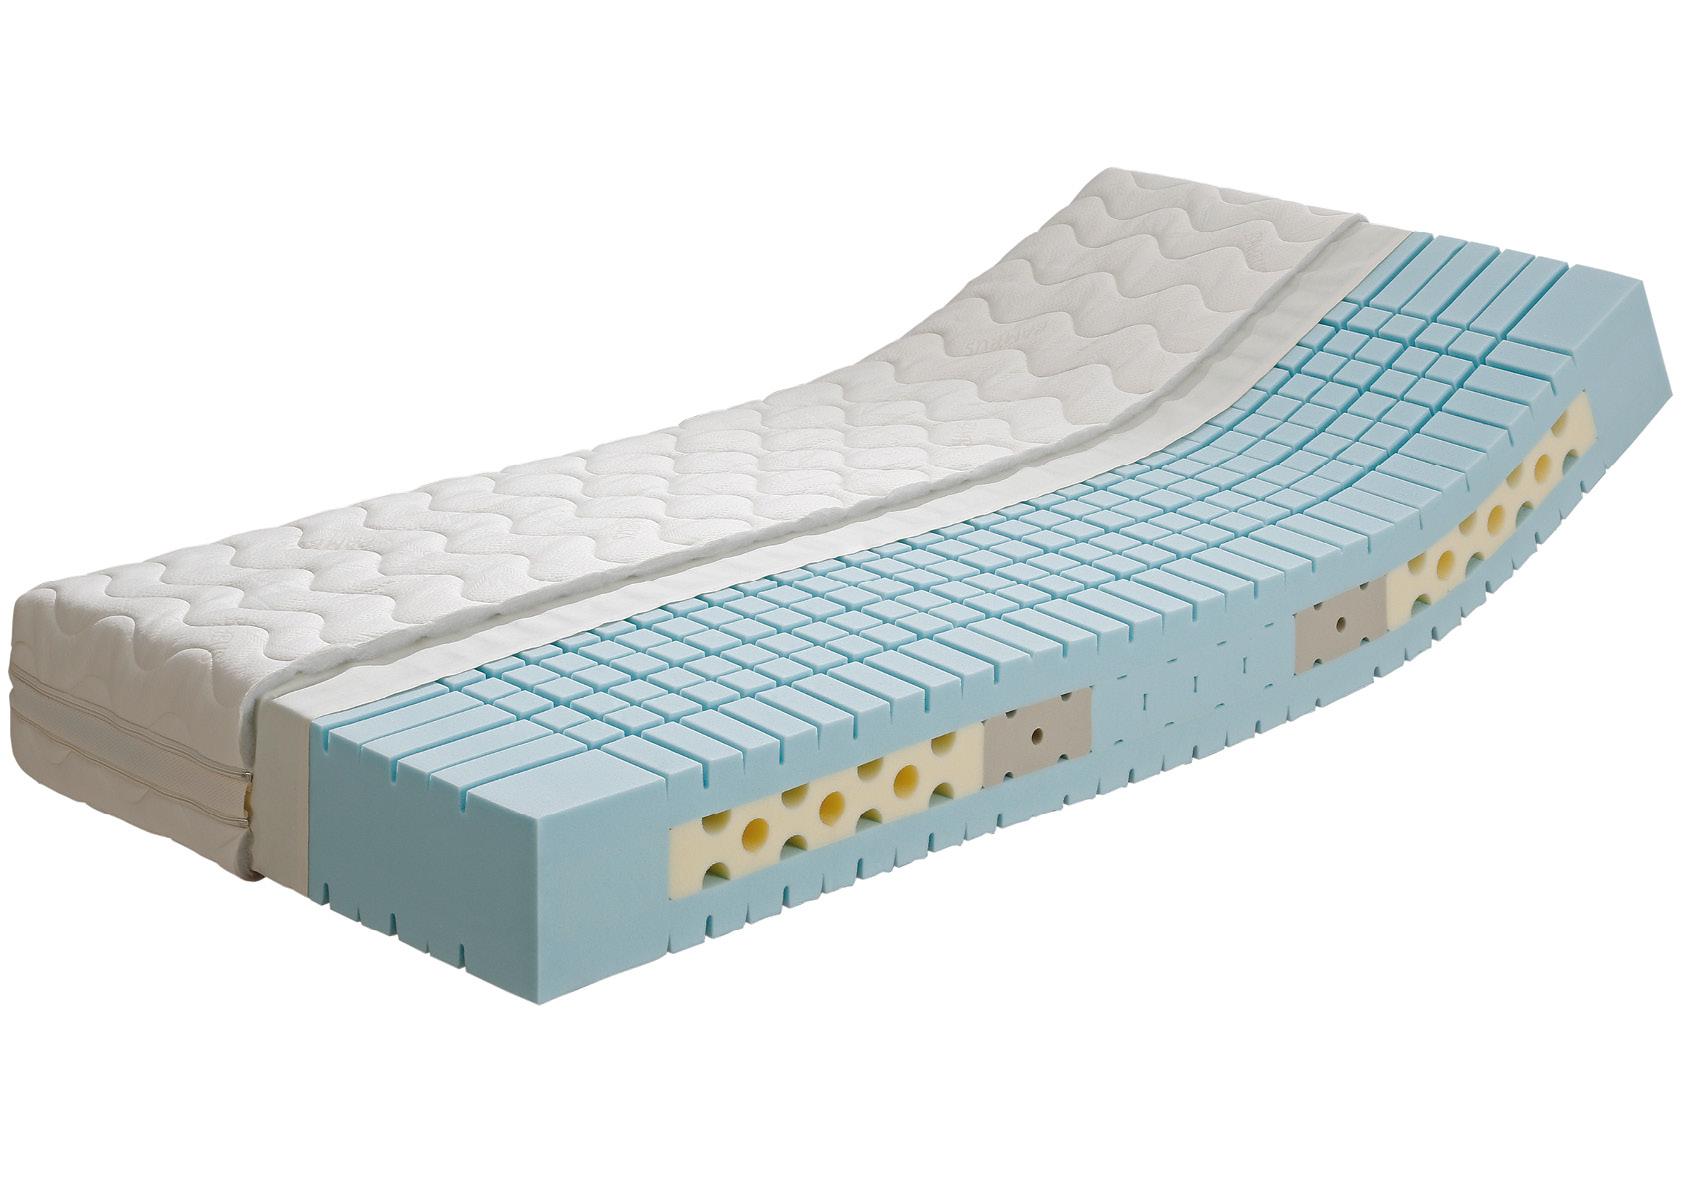 kaltschaum matratze vitana deluxe peter kling gmbh das bettenhaus m bel kling in pirmasens. Black Bedroom Furniture Sets. Home Design Ideas